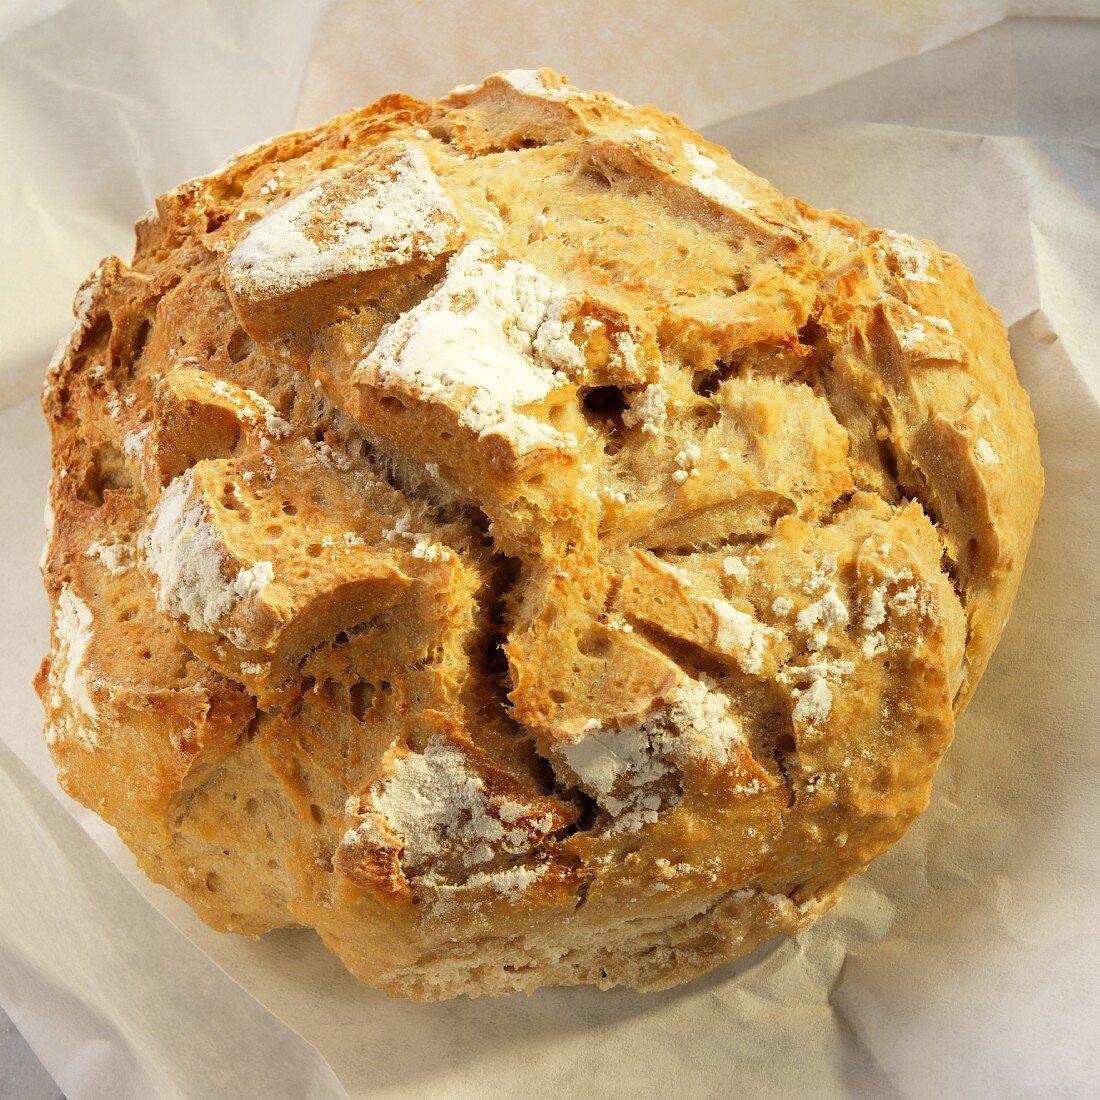 Loaf of Rustic Artisan Bread